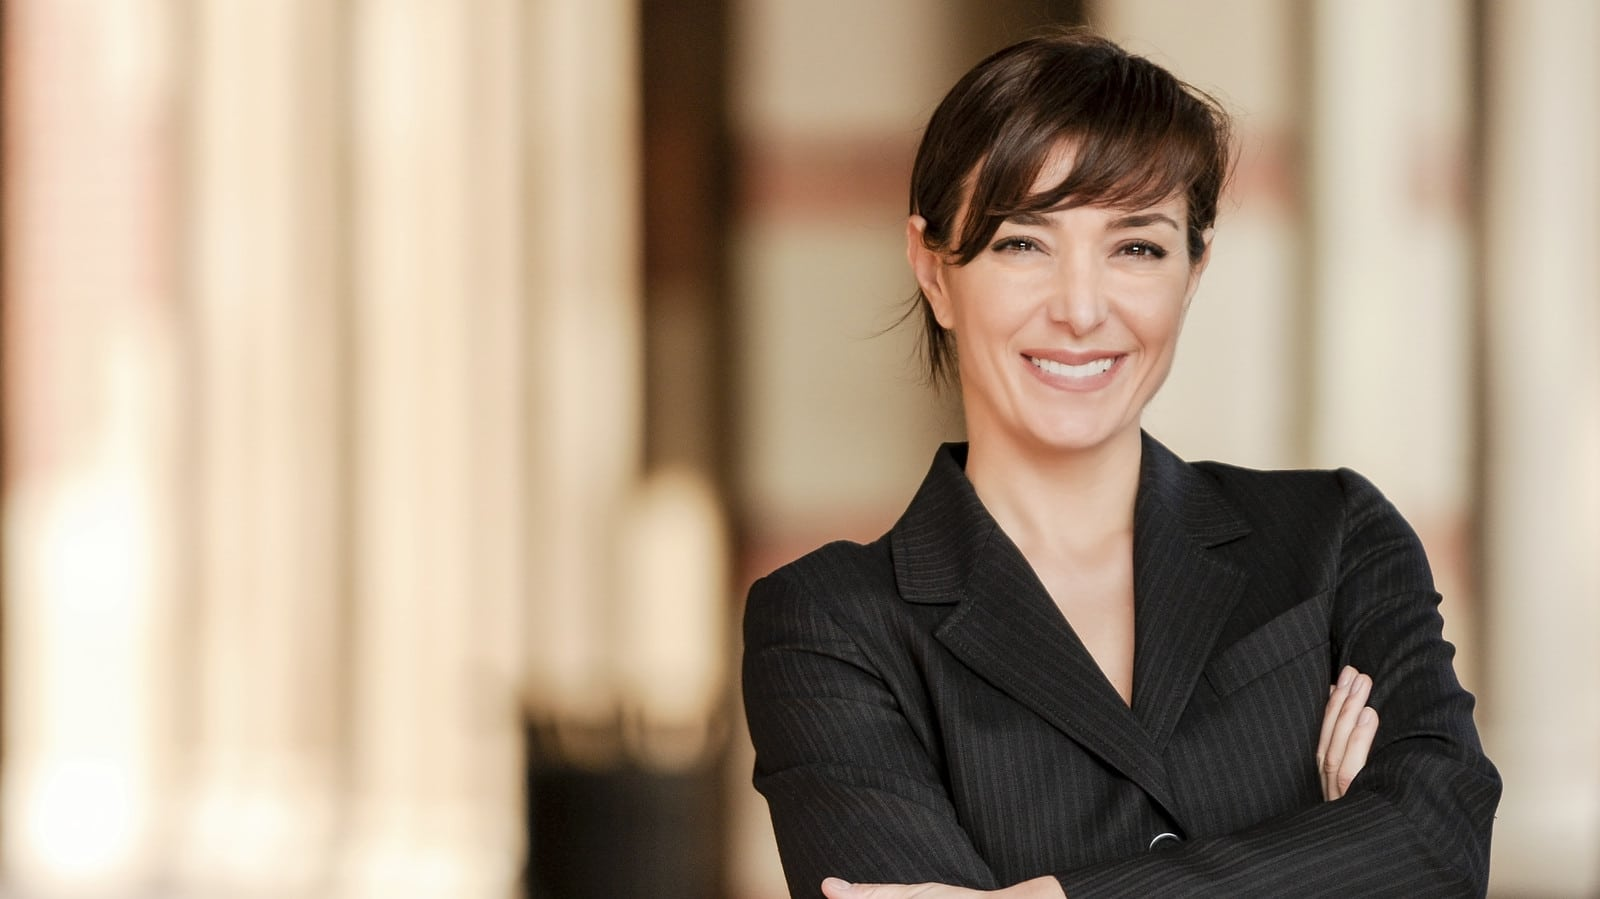 Smiling Female Attorney Stock Photo